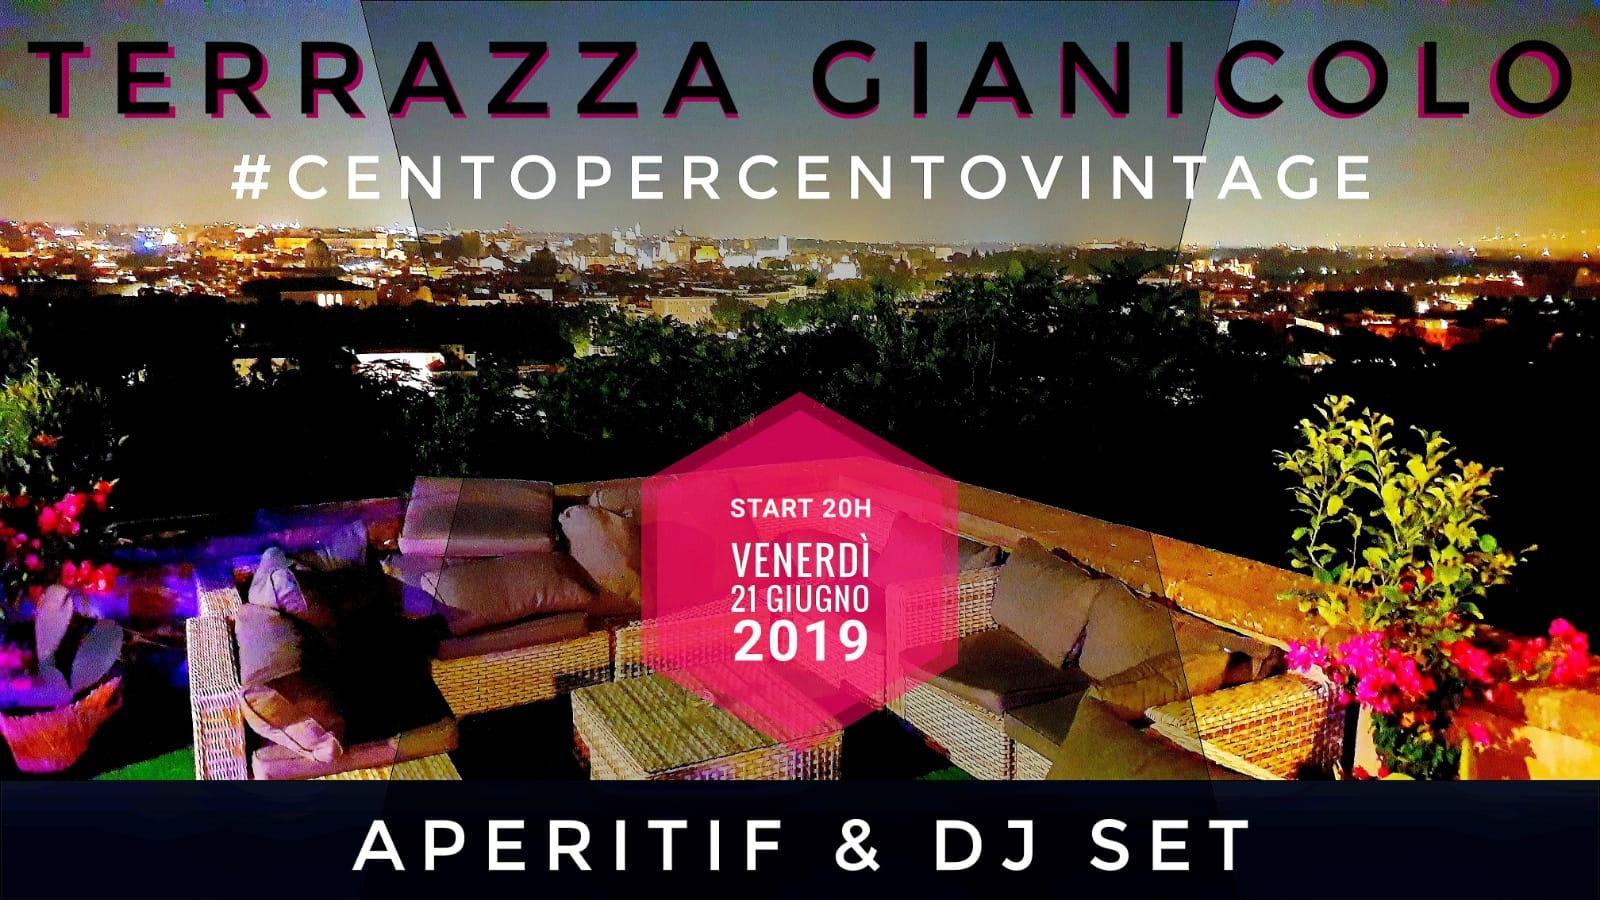 Discoteca Gianicolo Venerdì 21 Aperitivo In Terrazza Al Tramonto Djset 90